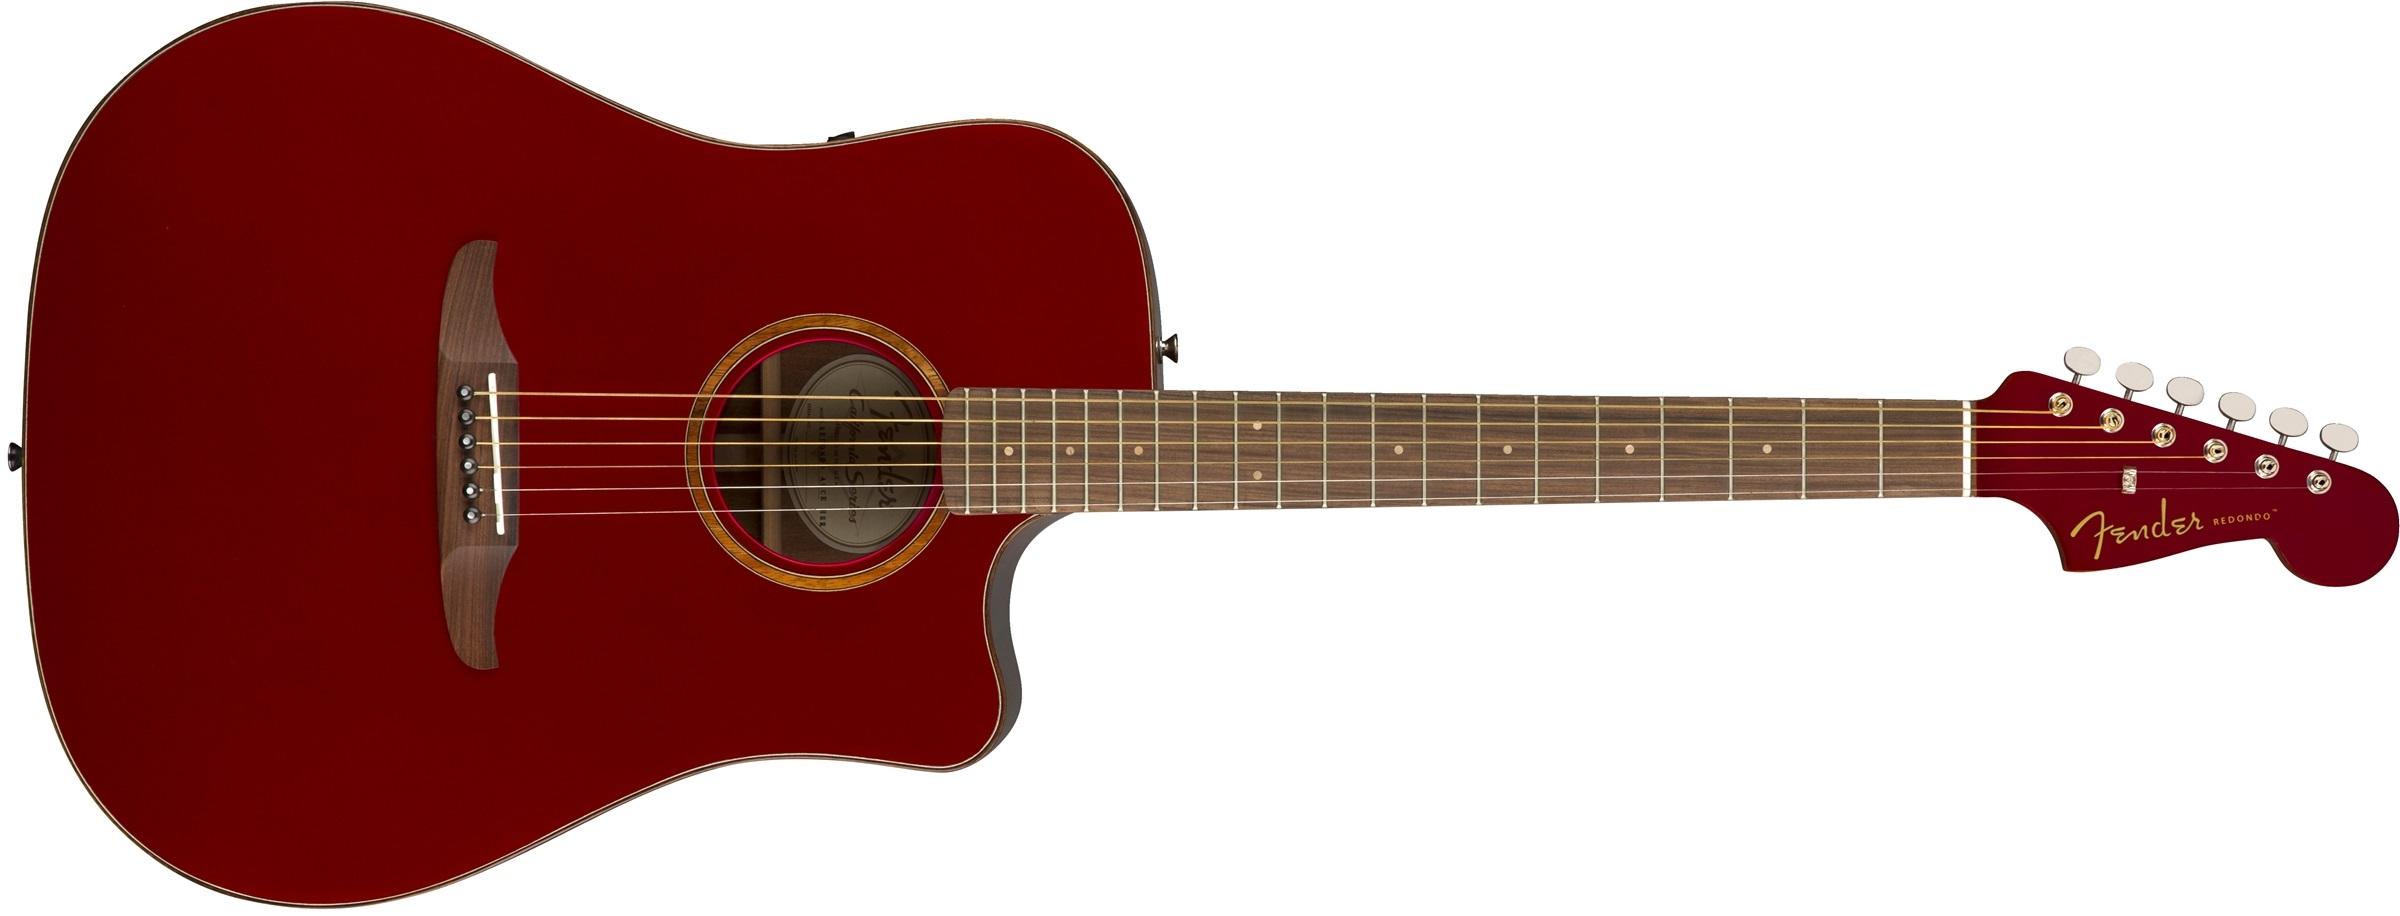 Fender Redondo Classic HRM